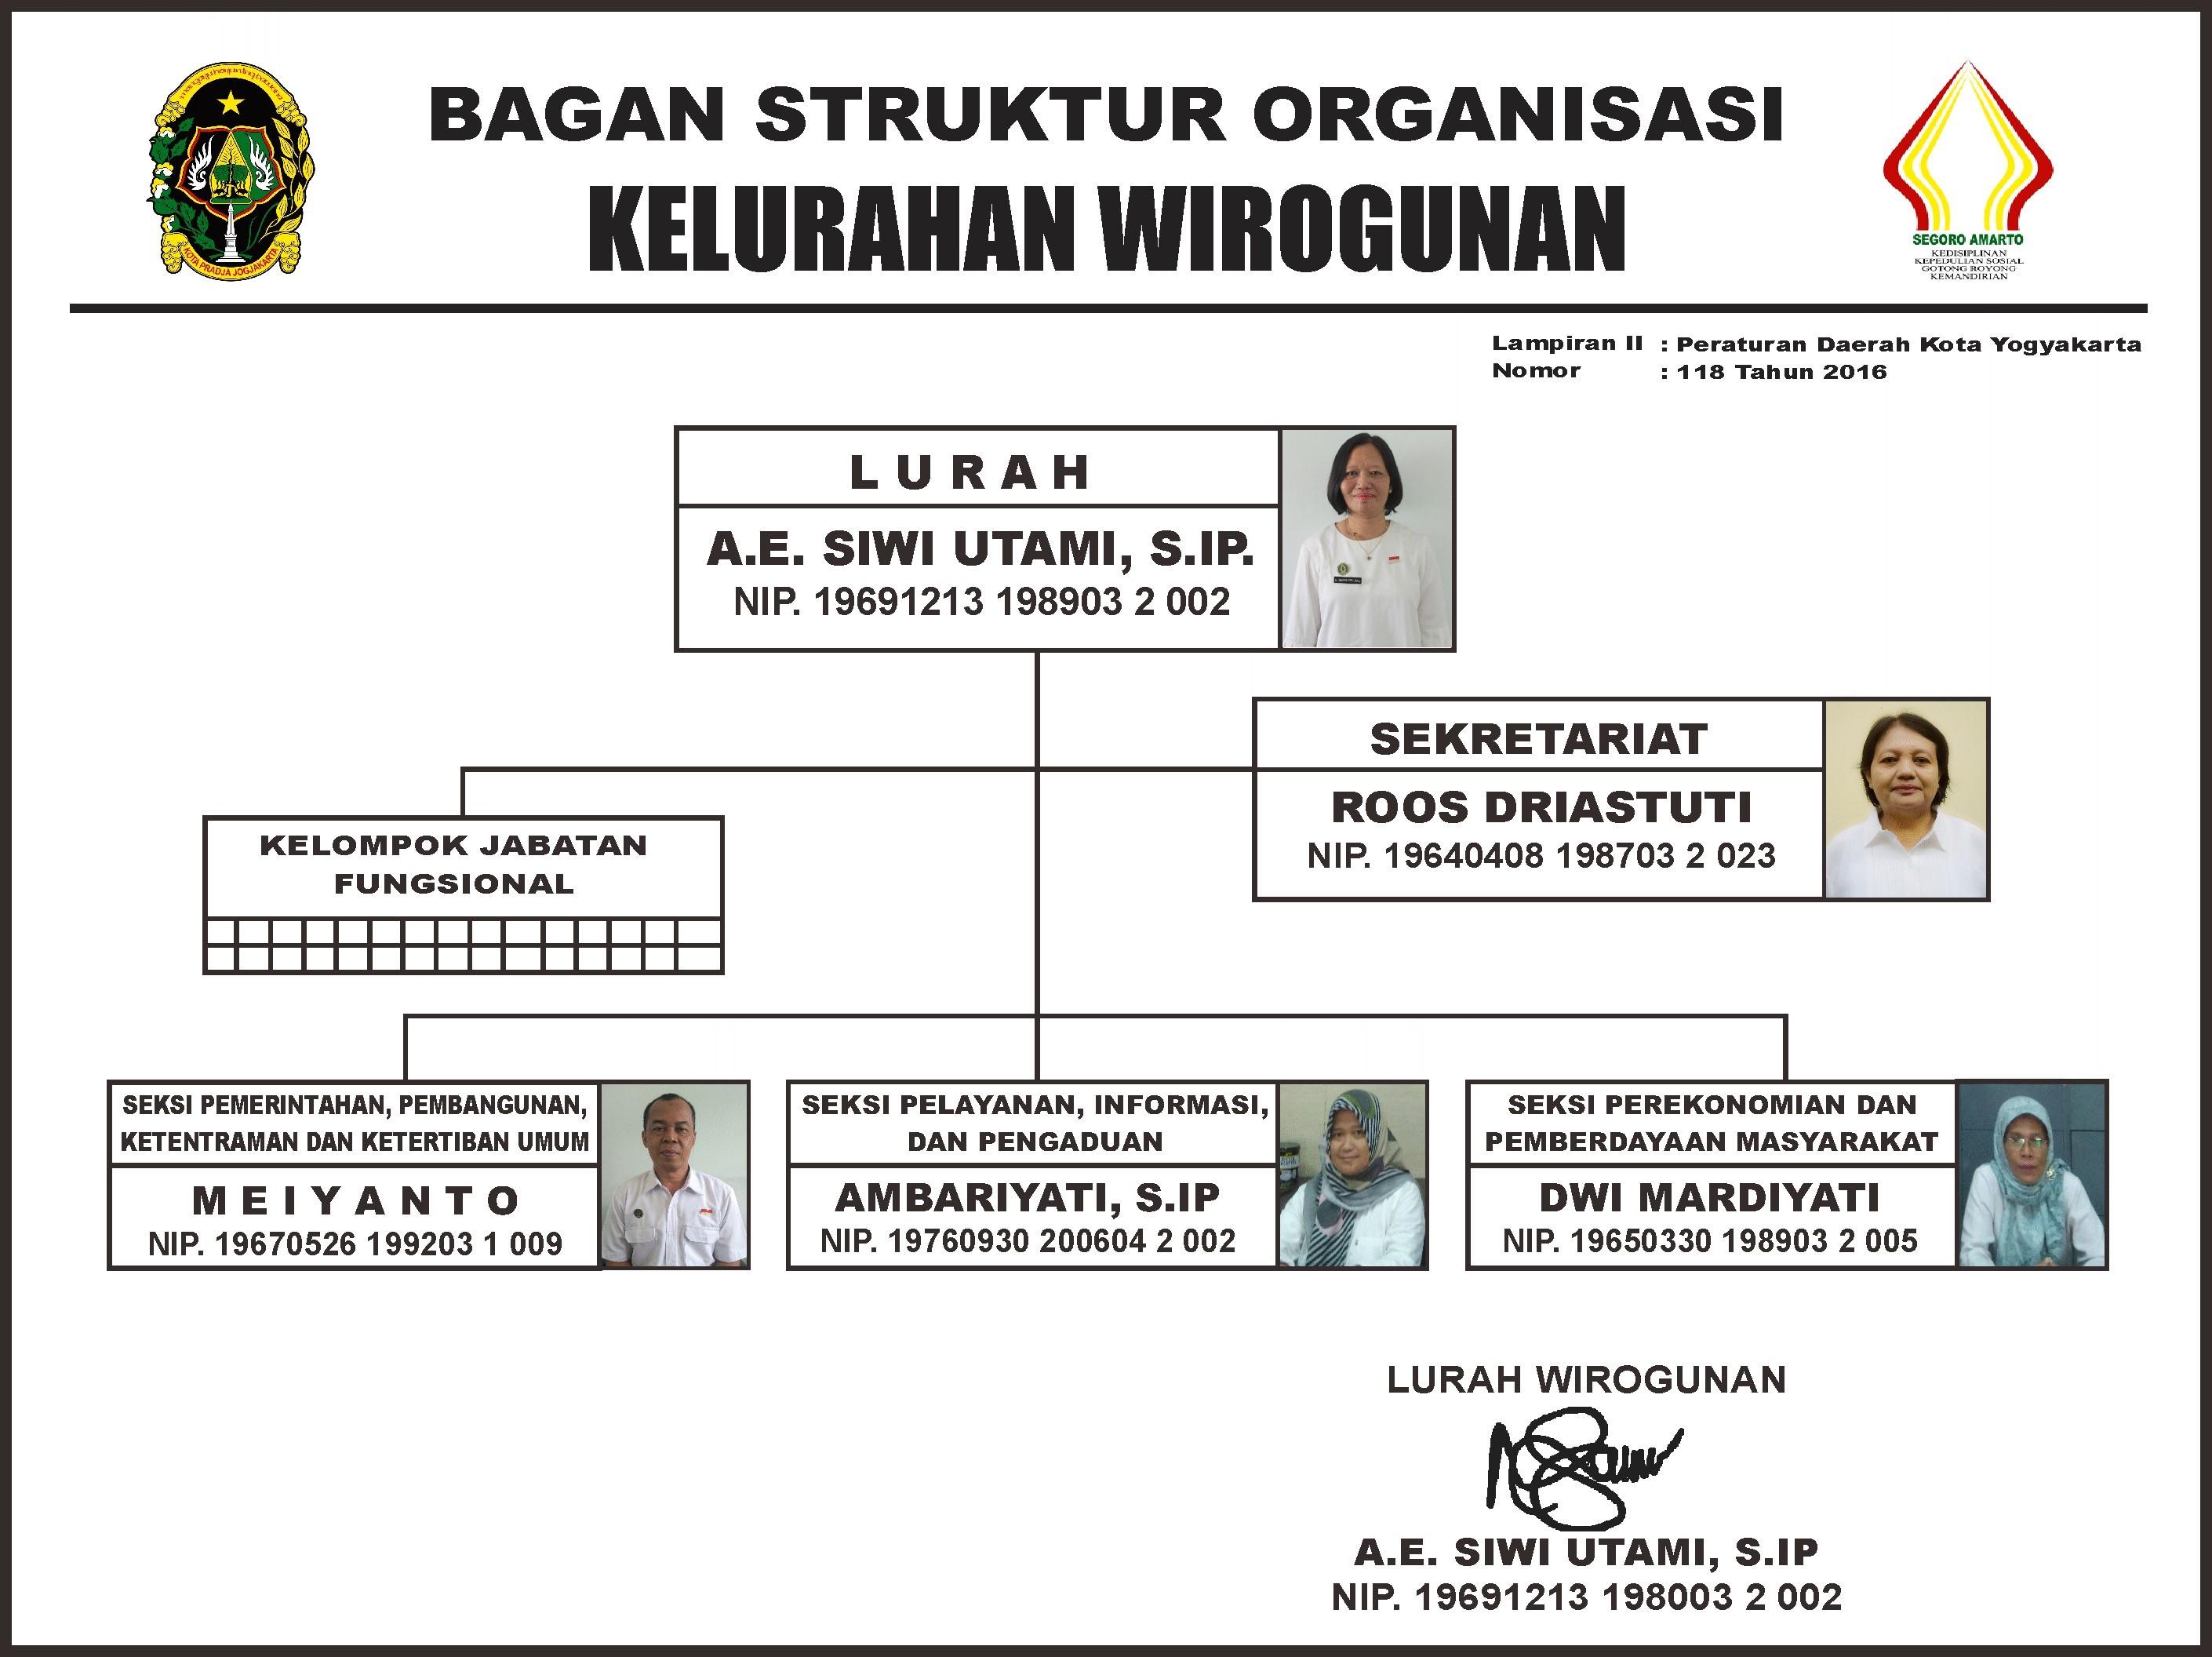 Struktur Organisasi Kelurahan Wirogunan